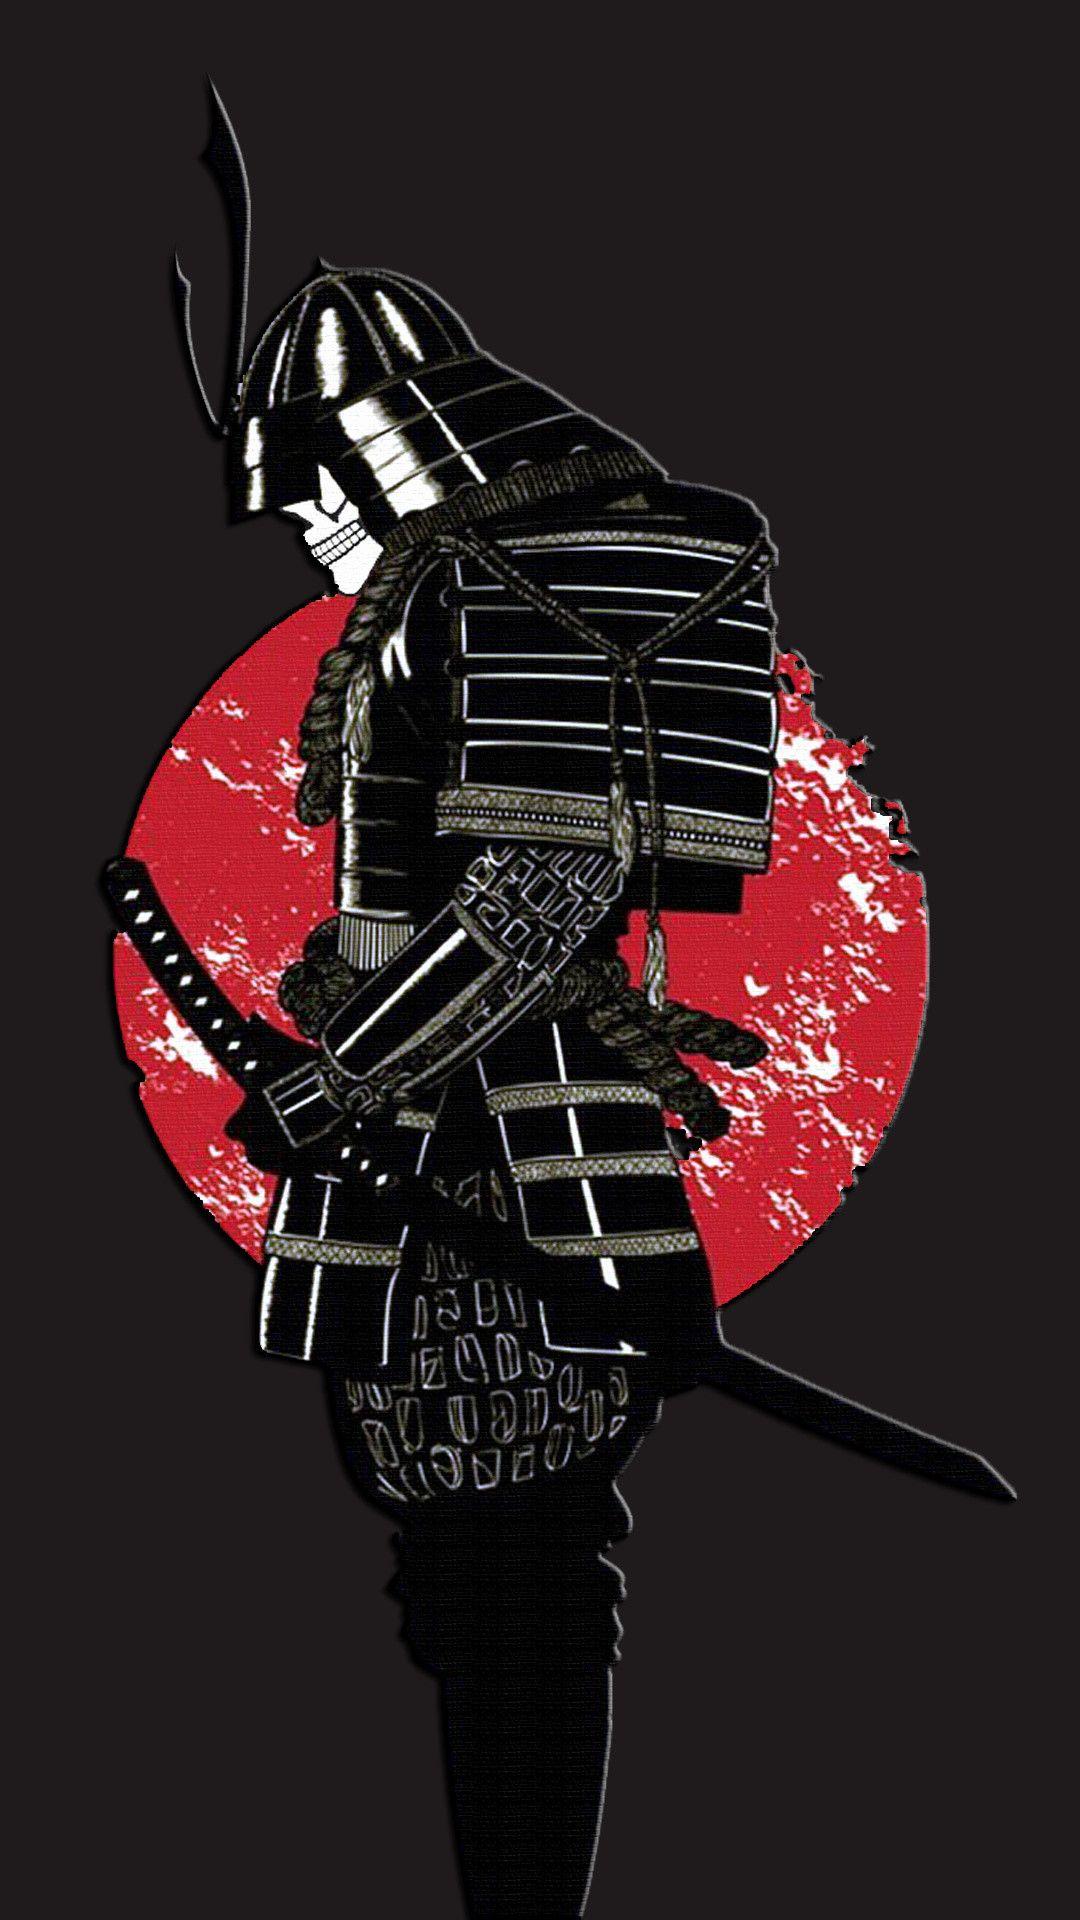 68 Hd Samurai Wallpapers On Wallpaperplay Samurai Wallpaper Samurai Artwork Samurai Warrior Tattoo